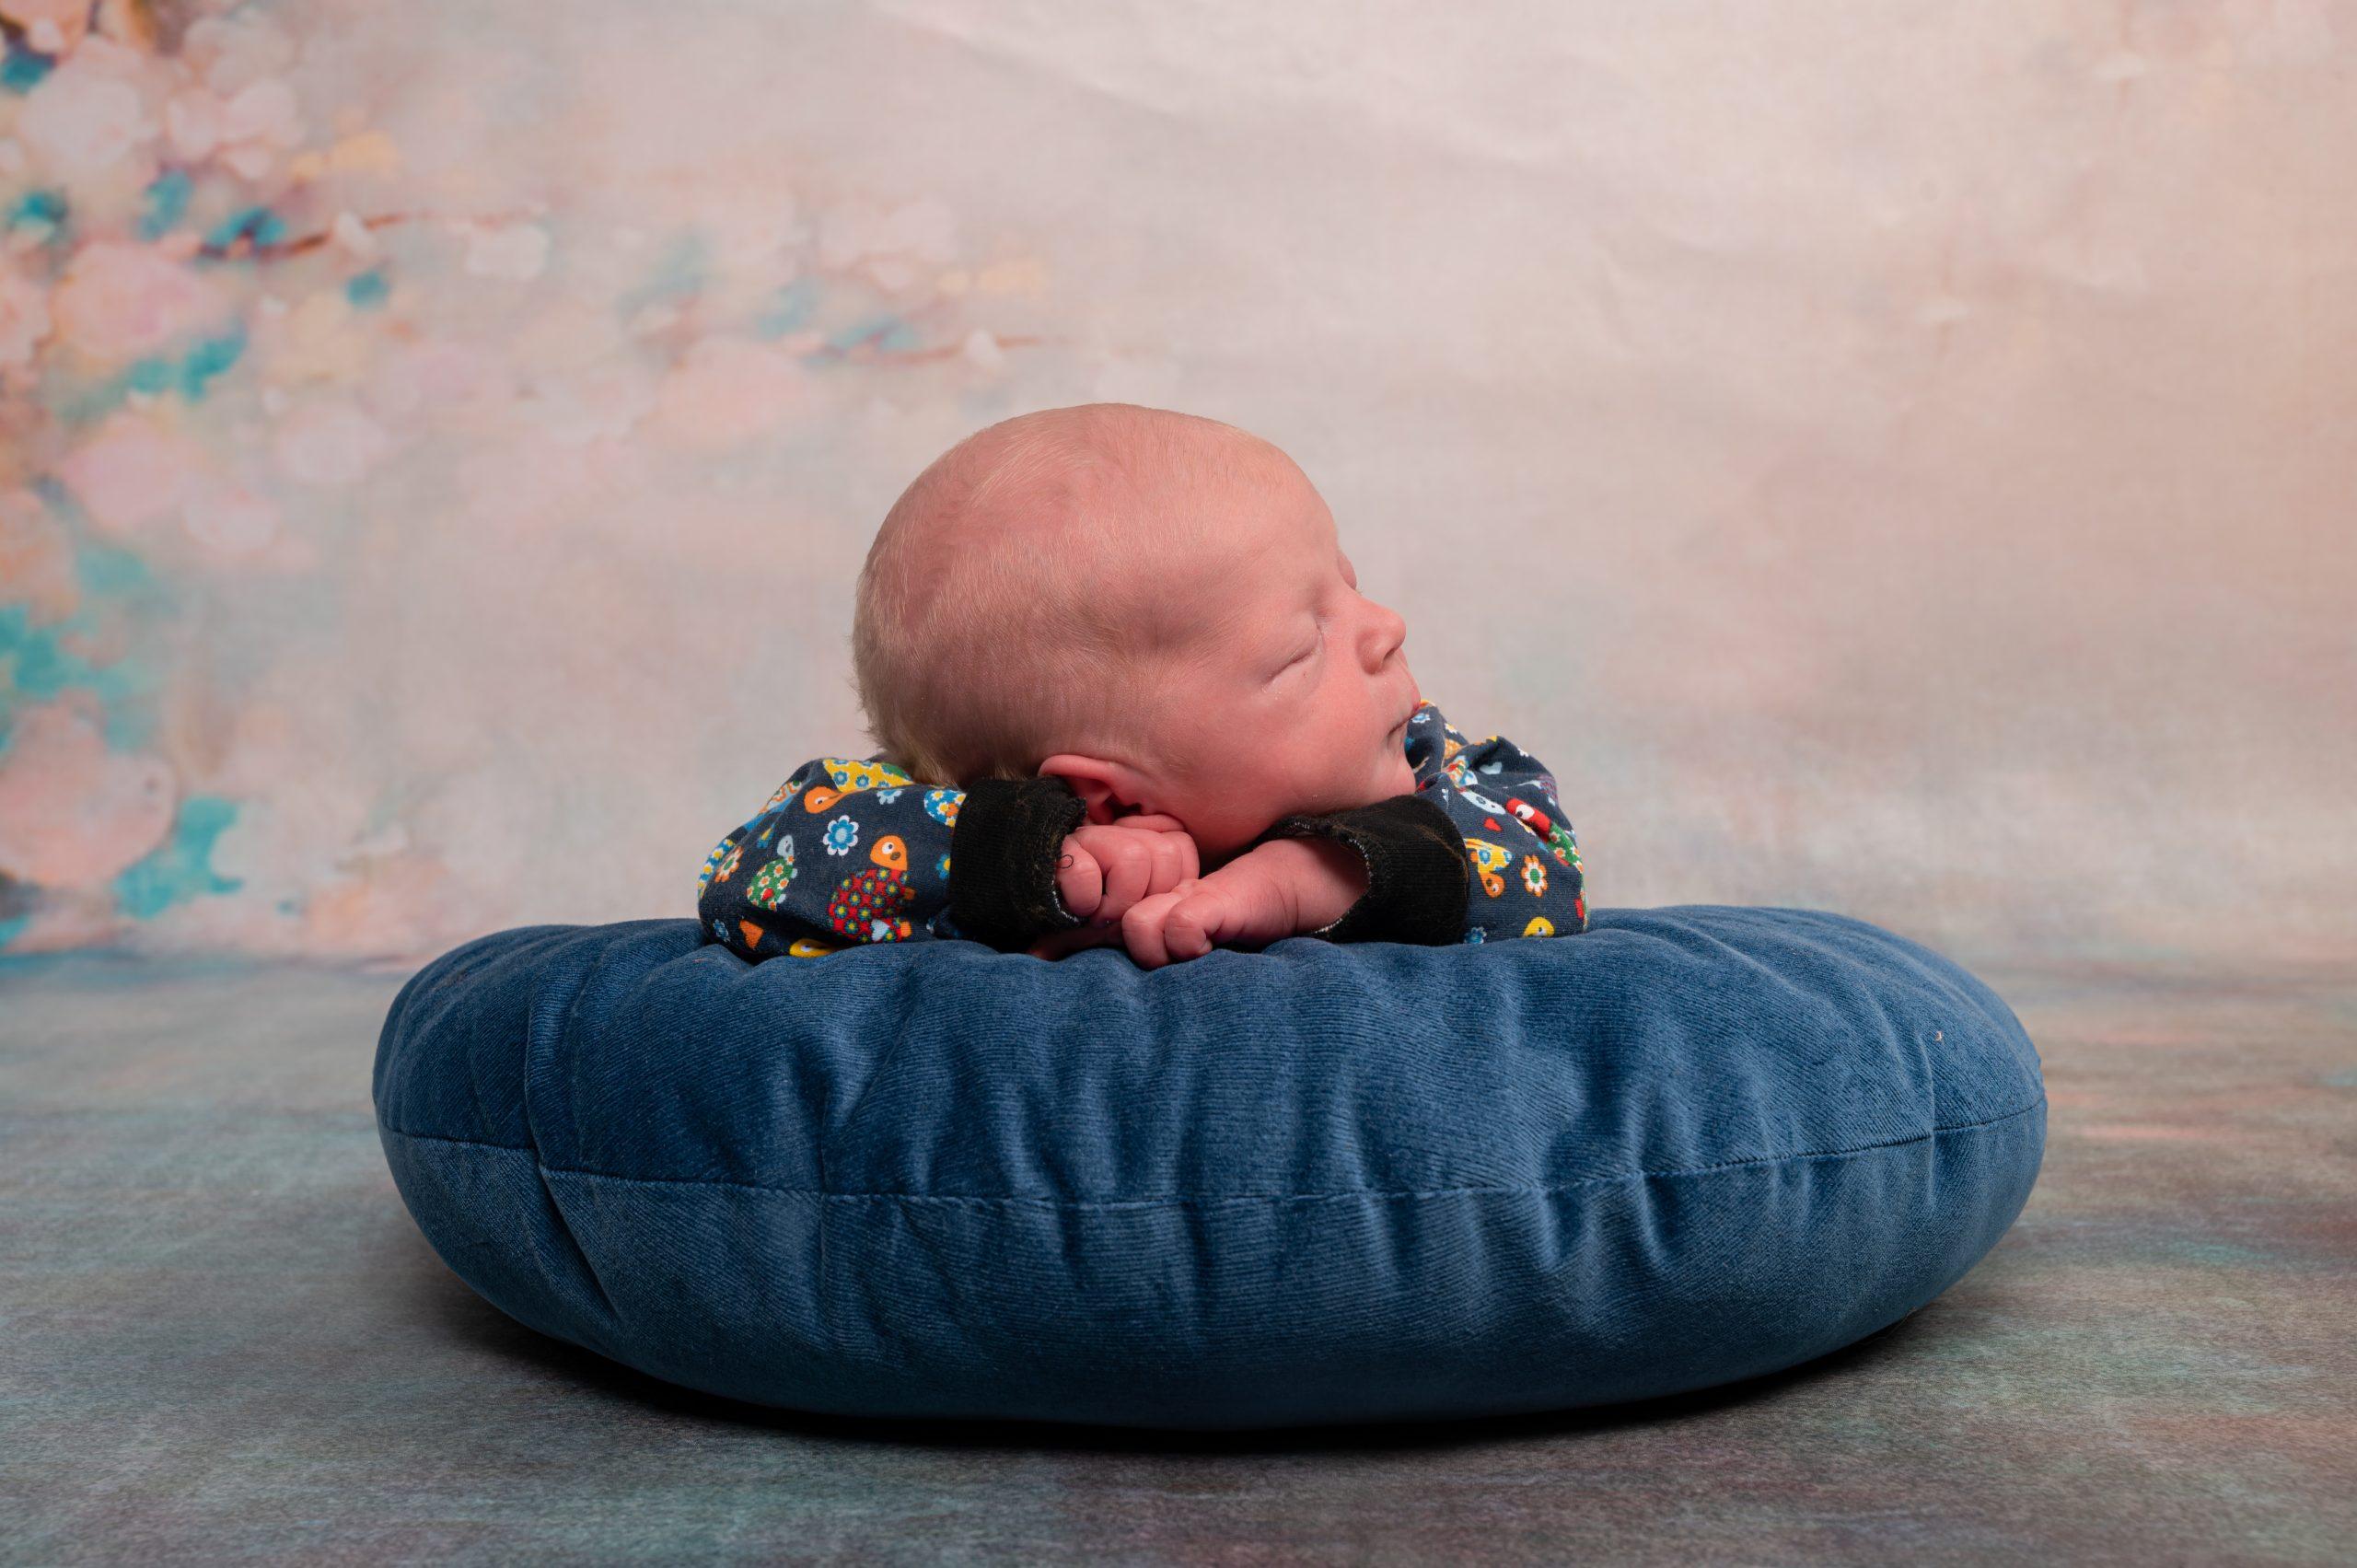 newborn fotoshoot, kinder fotoshoot, kids fotoshoot, puber fotoschoot Sophia fotografie